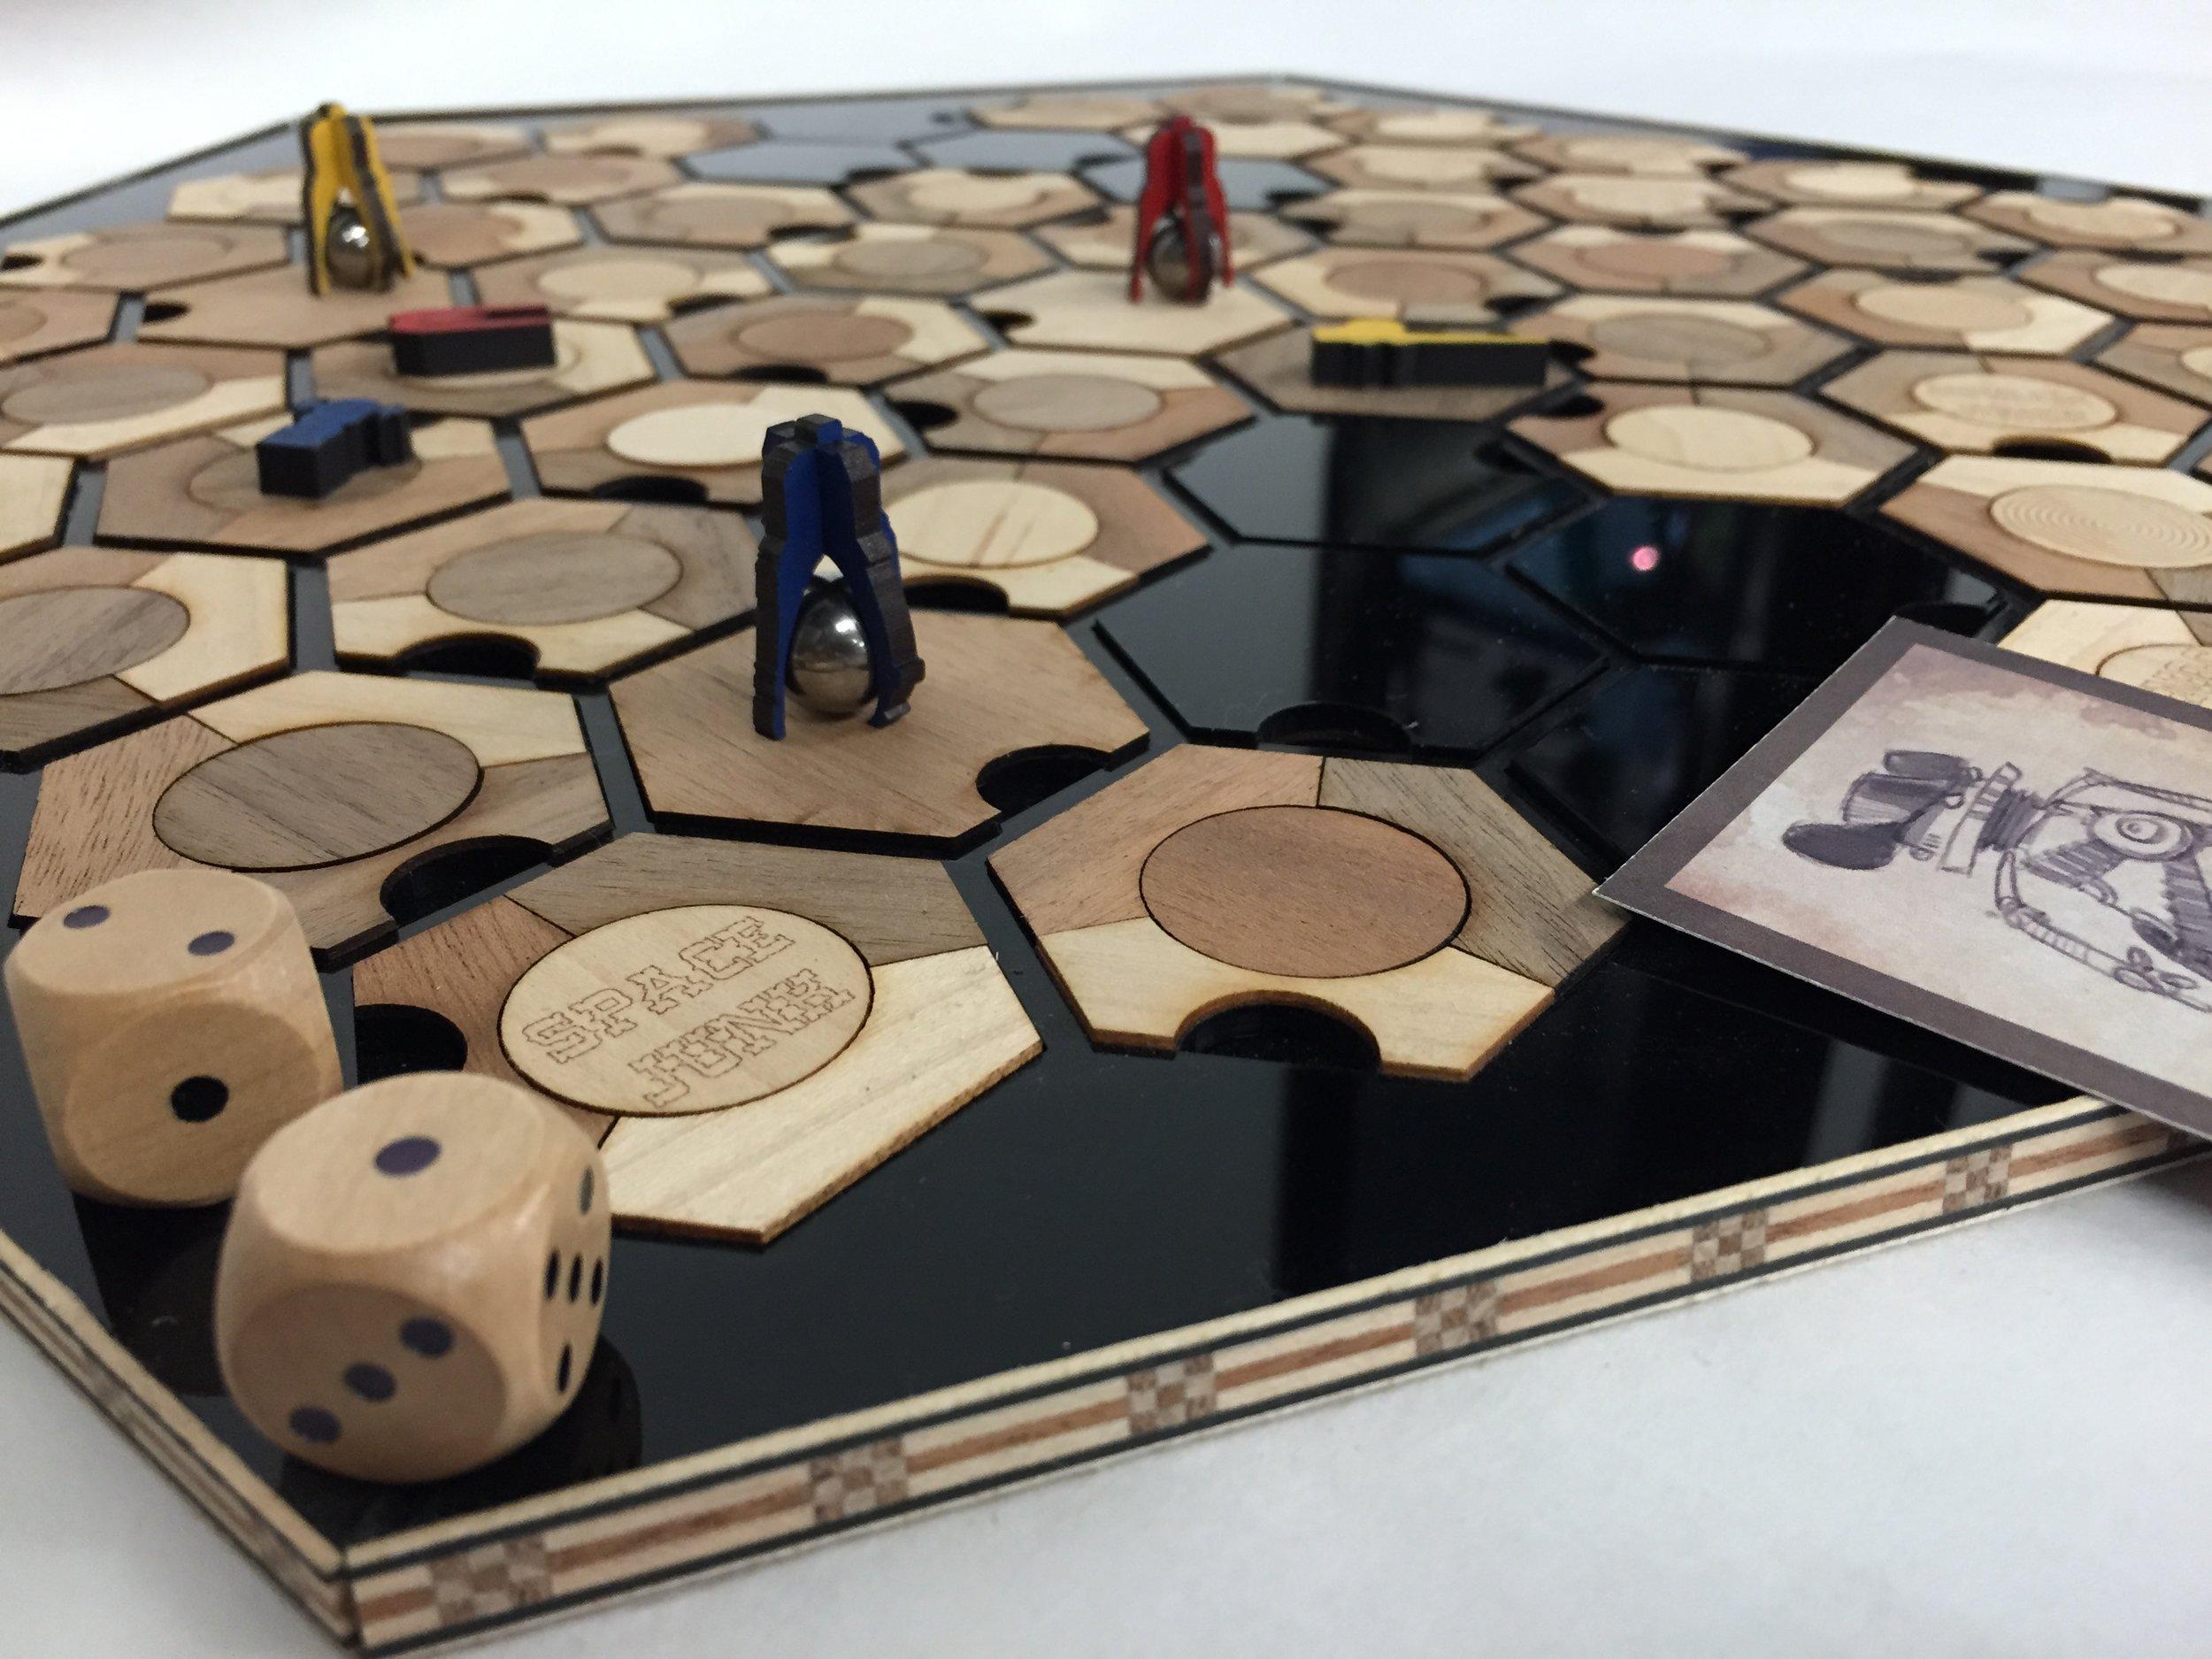 Joe-Kane-Industrial-Design-Minnesota-Supernova-Showdown-Board.jpg